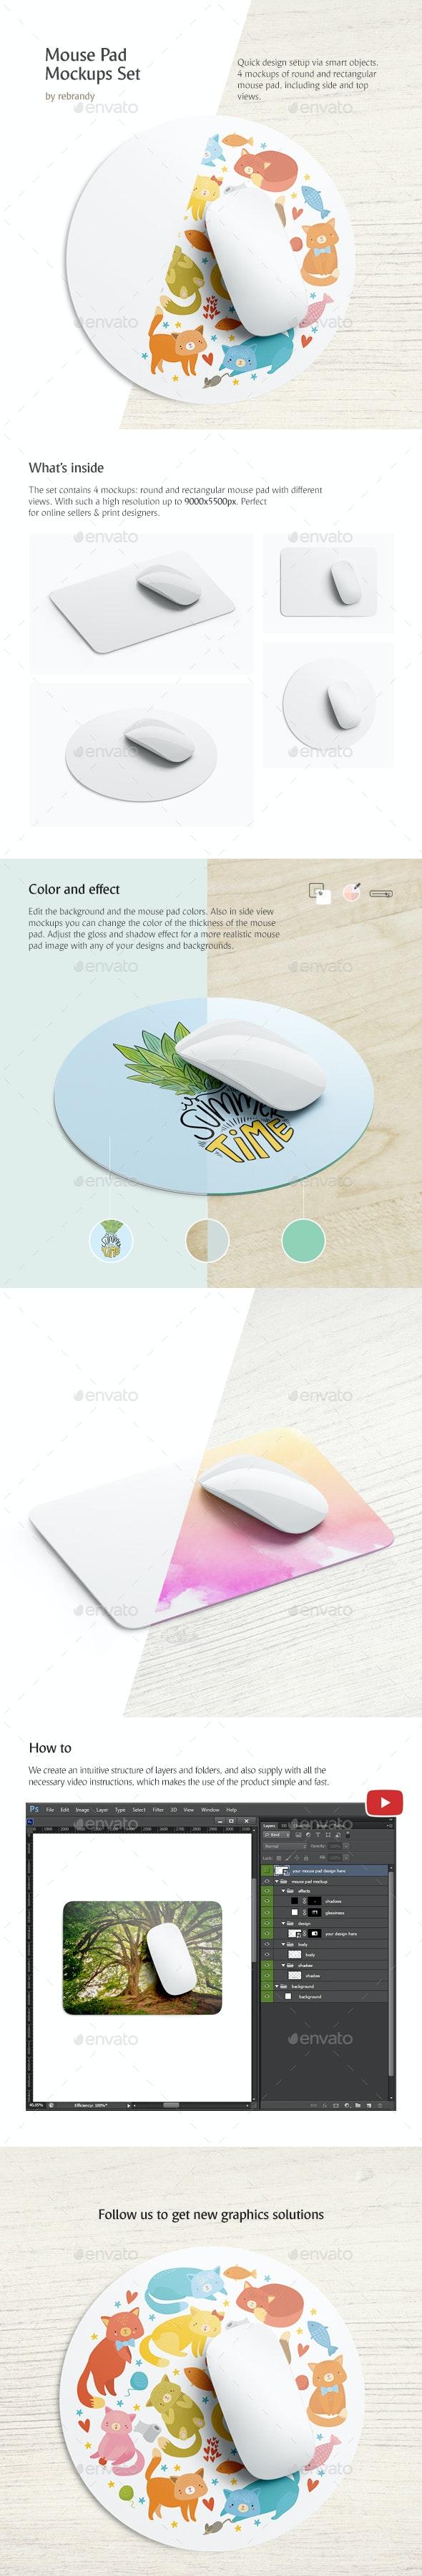 Mouse Pad Mockups Set - Product Mock-Ups Graphics